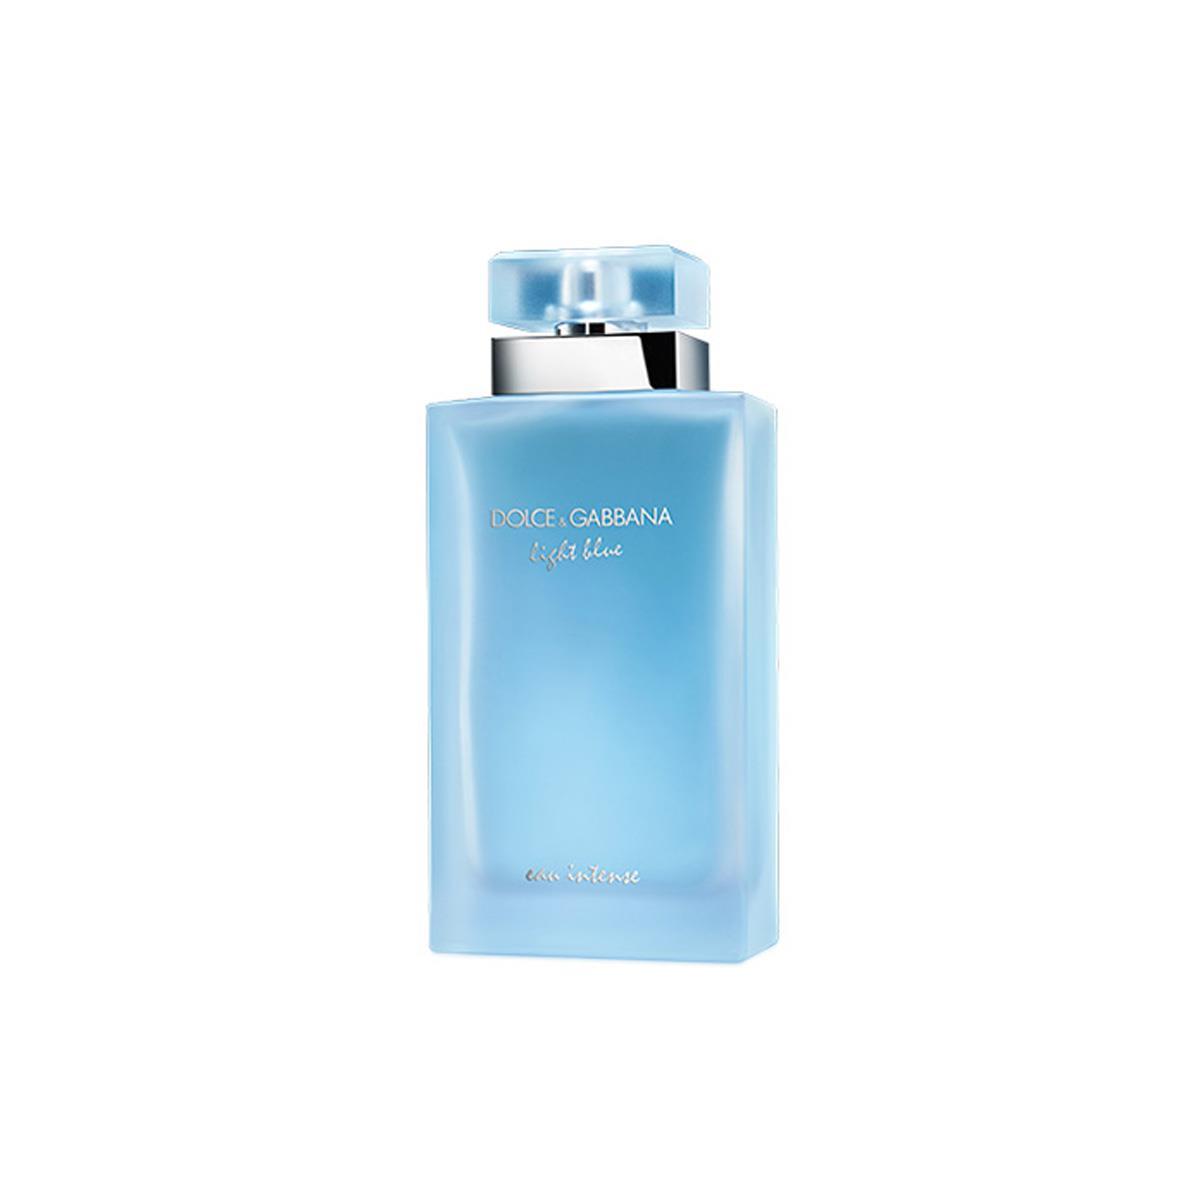 Perfume Dolce Gabbana Light Blue Eau Intense Feminino 03c0213849